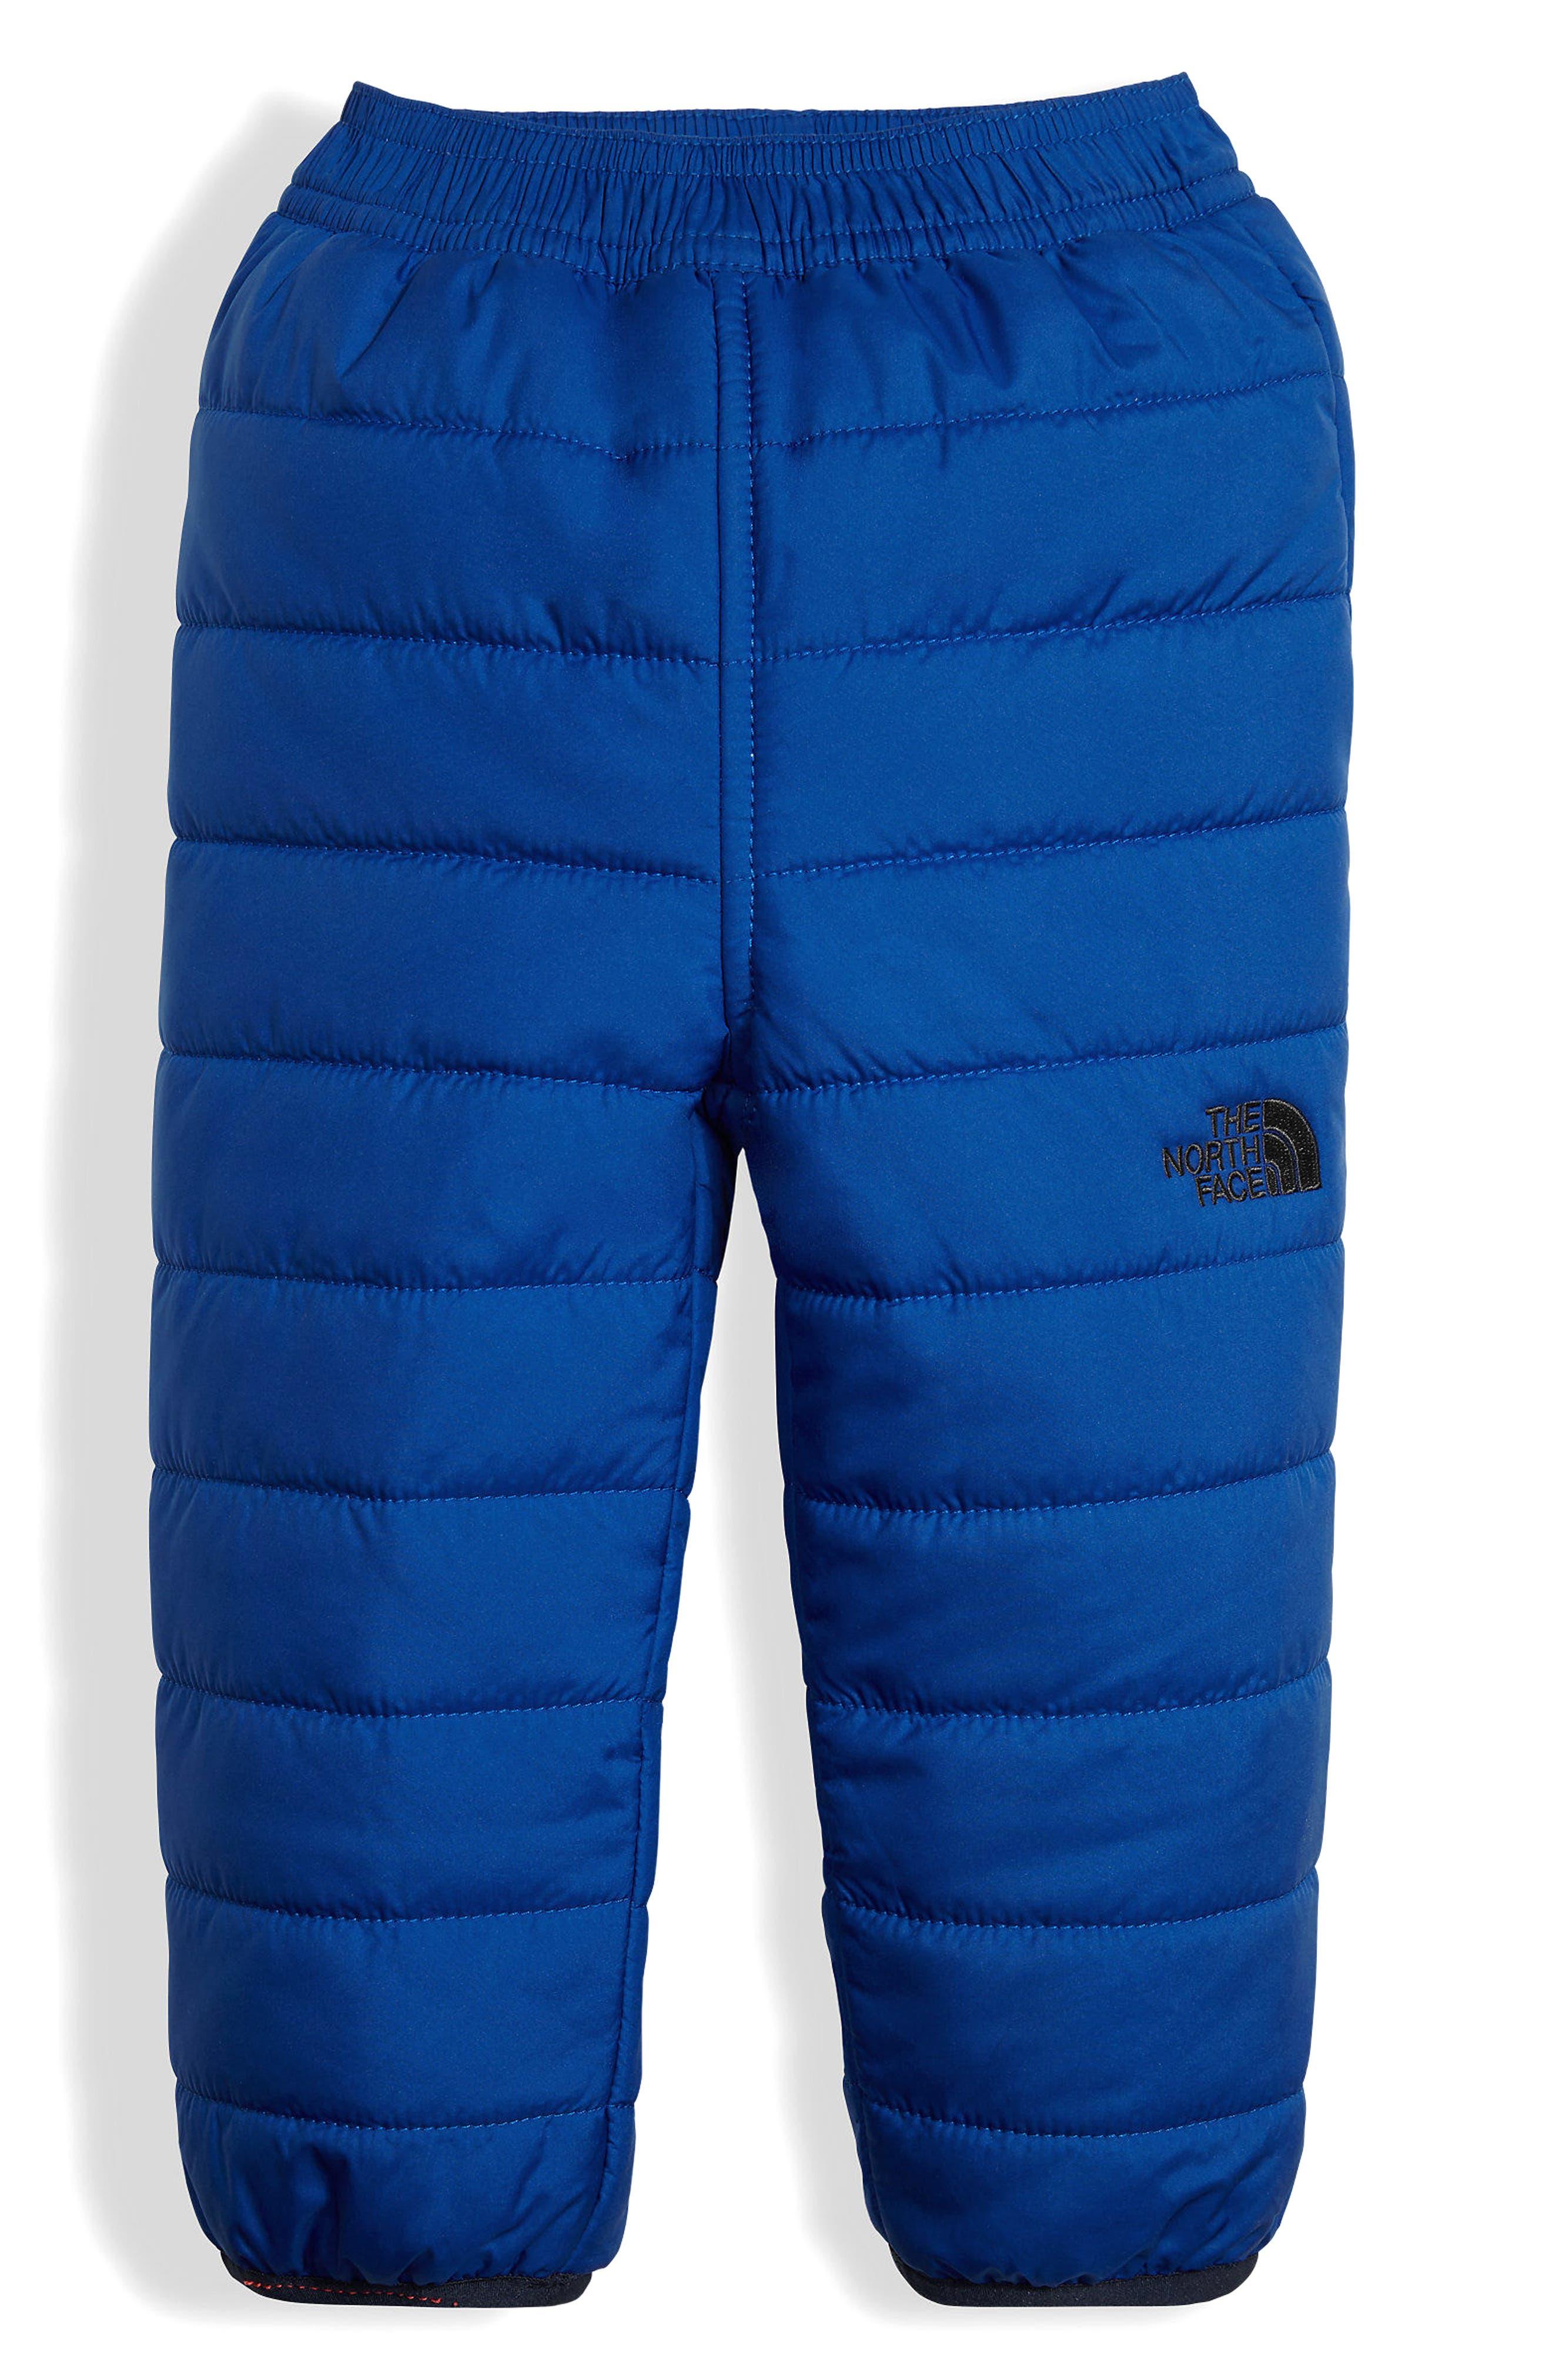 Perrito Reversible Water Repellent Pants,                         Main,                         color, Bright Cobalt Blue